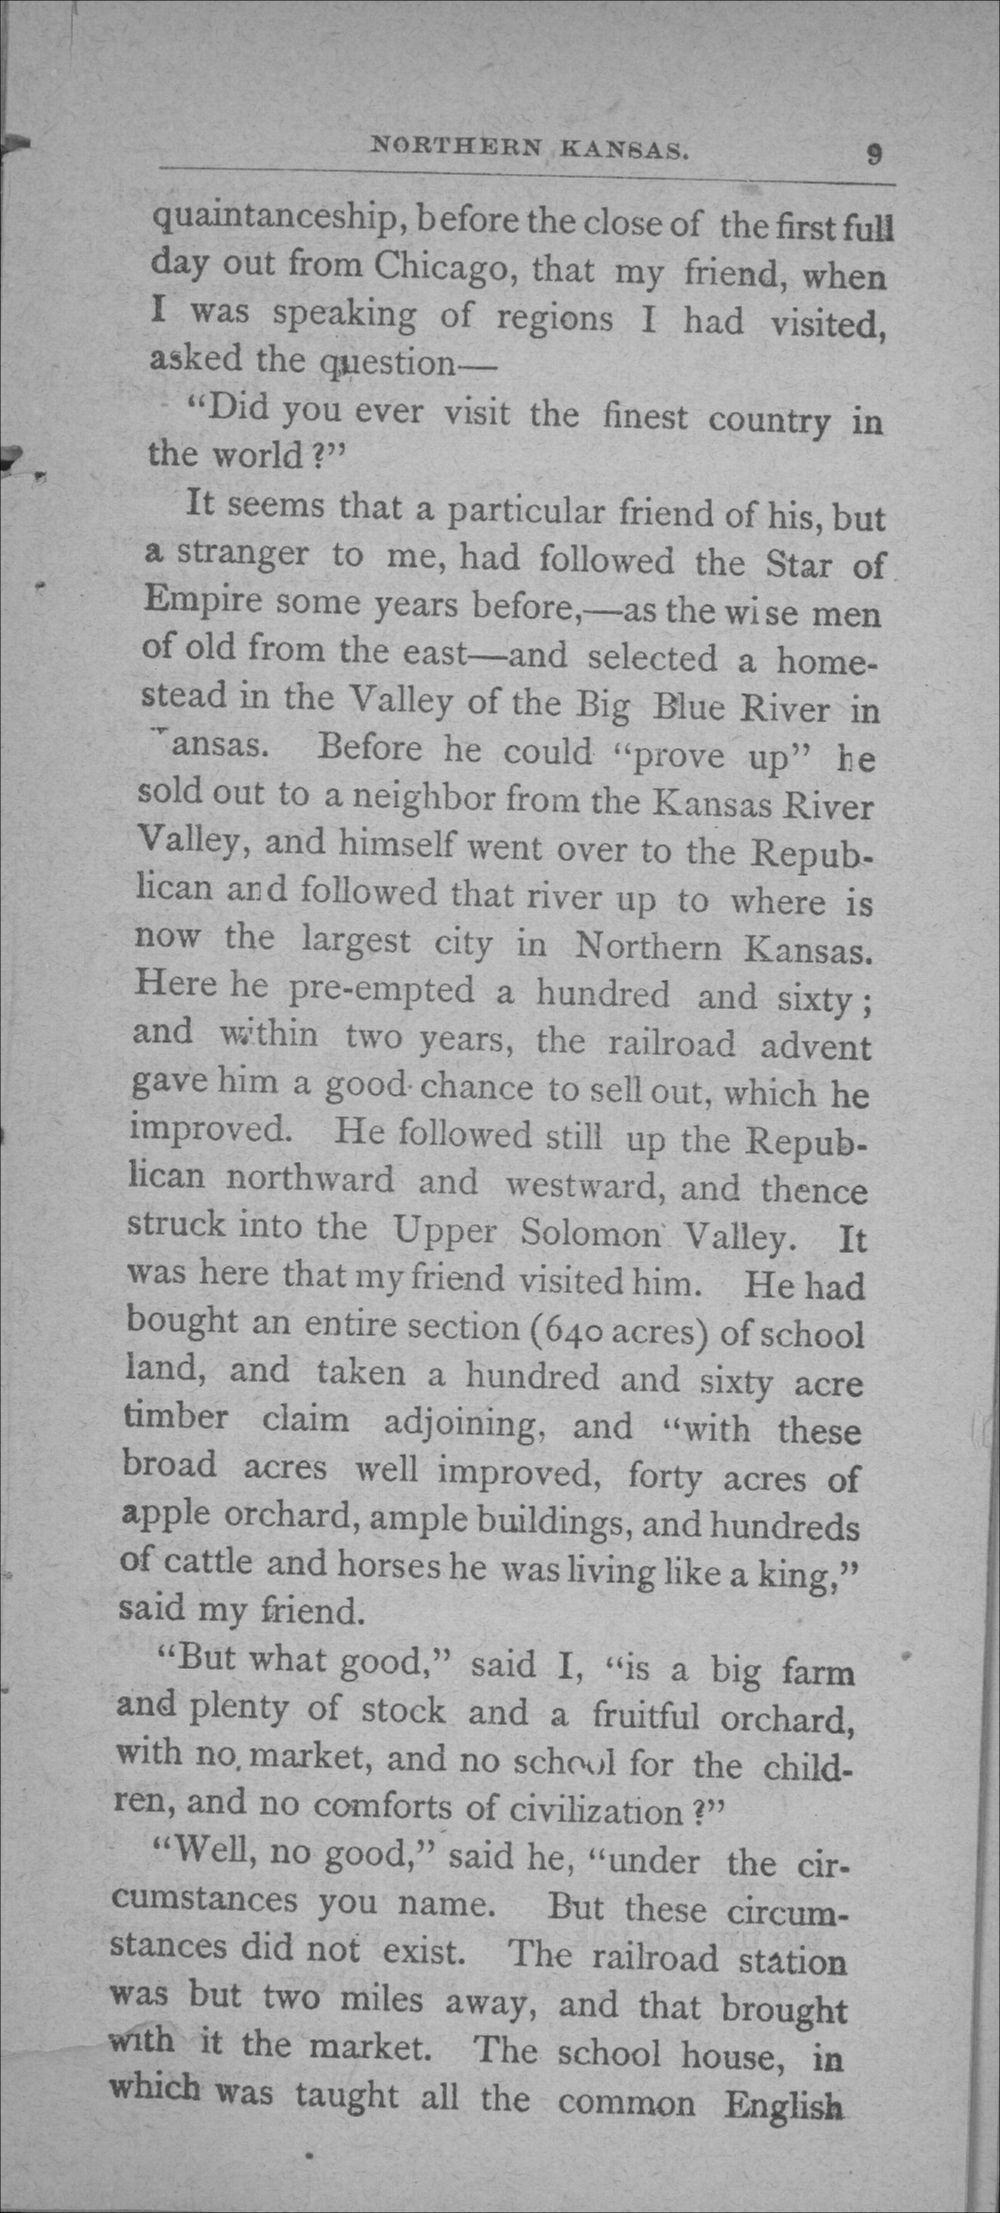 The great northwest! - 9